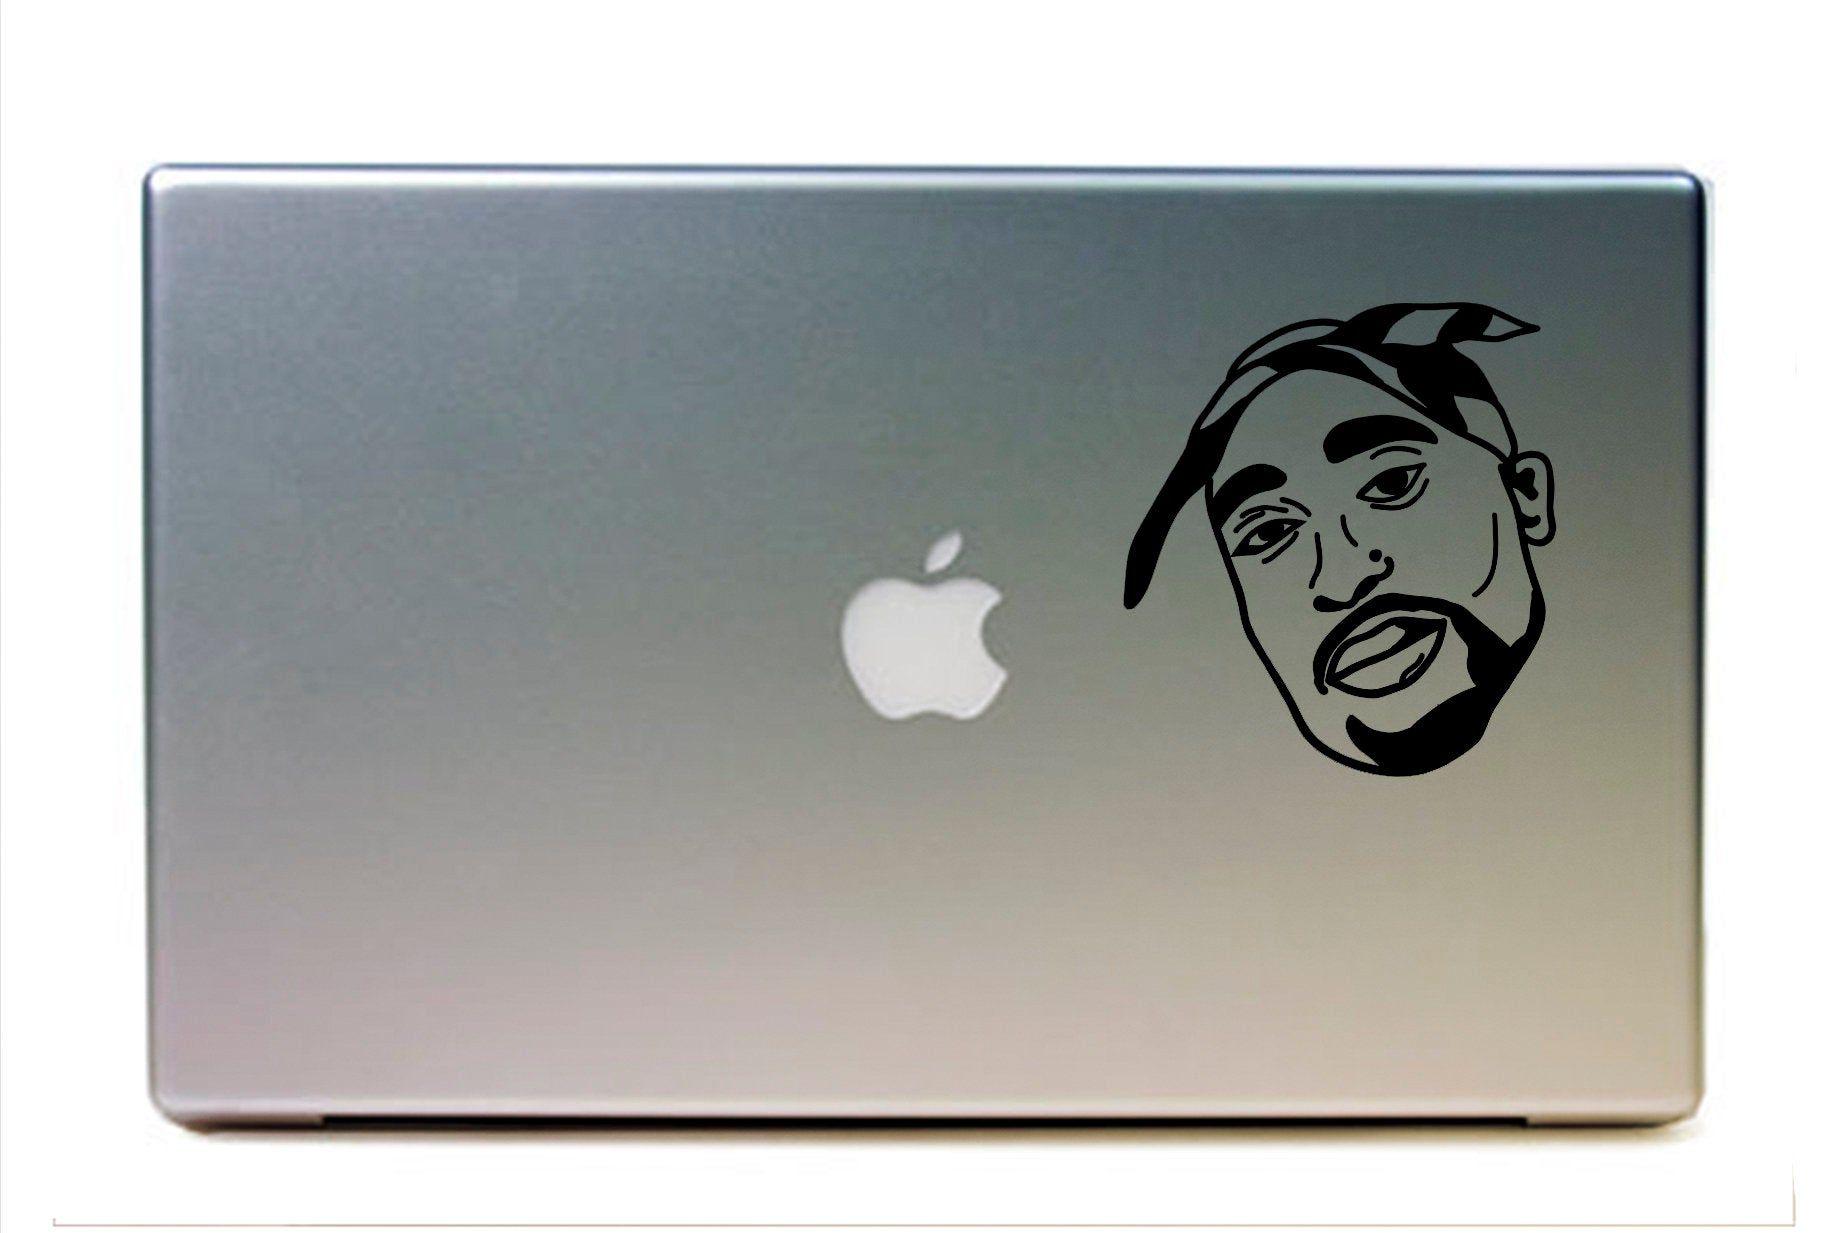 Tupac Face Tupac Thug Life Tupac Shakur Makaveli Decal Sticker Car Window Decal Wall Sticker Labtop Decal Vinyl Art Vinyl Art Vinyl Decals Window Stickers [ 1233 x 1826 Pixel ]